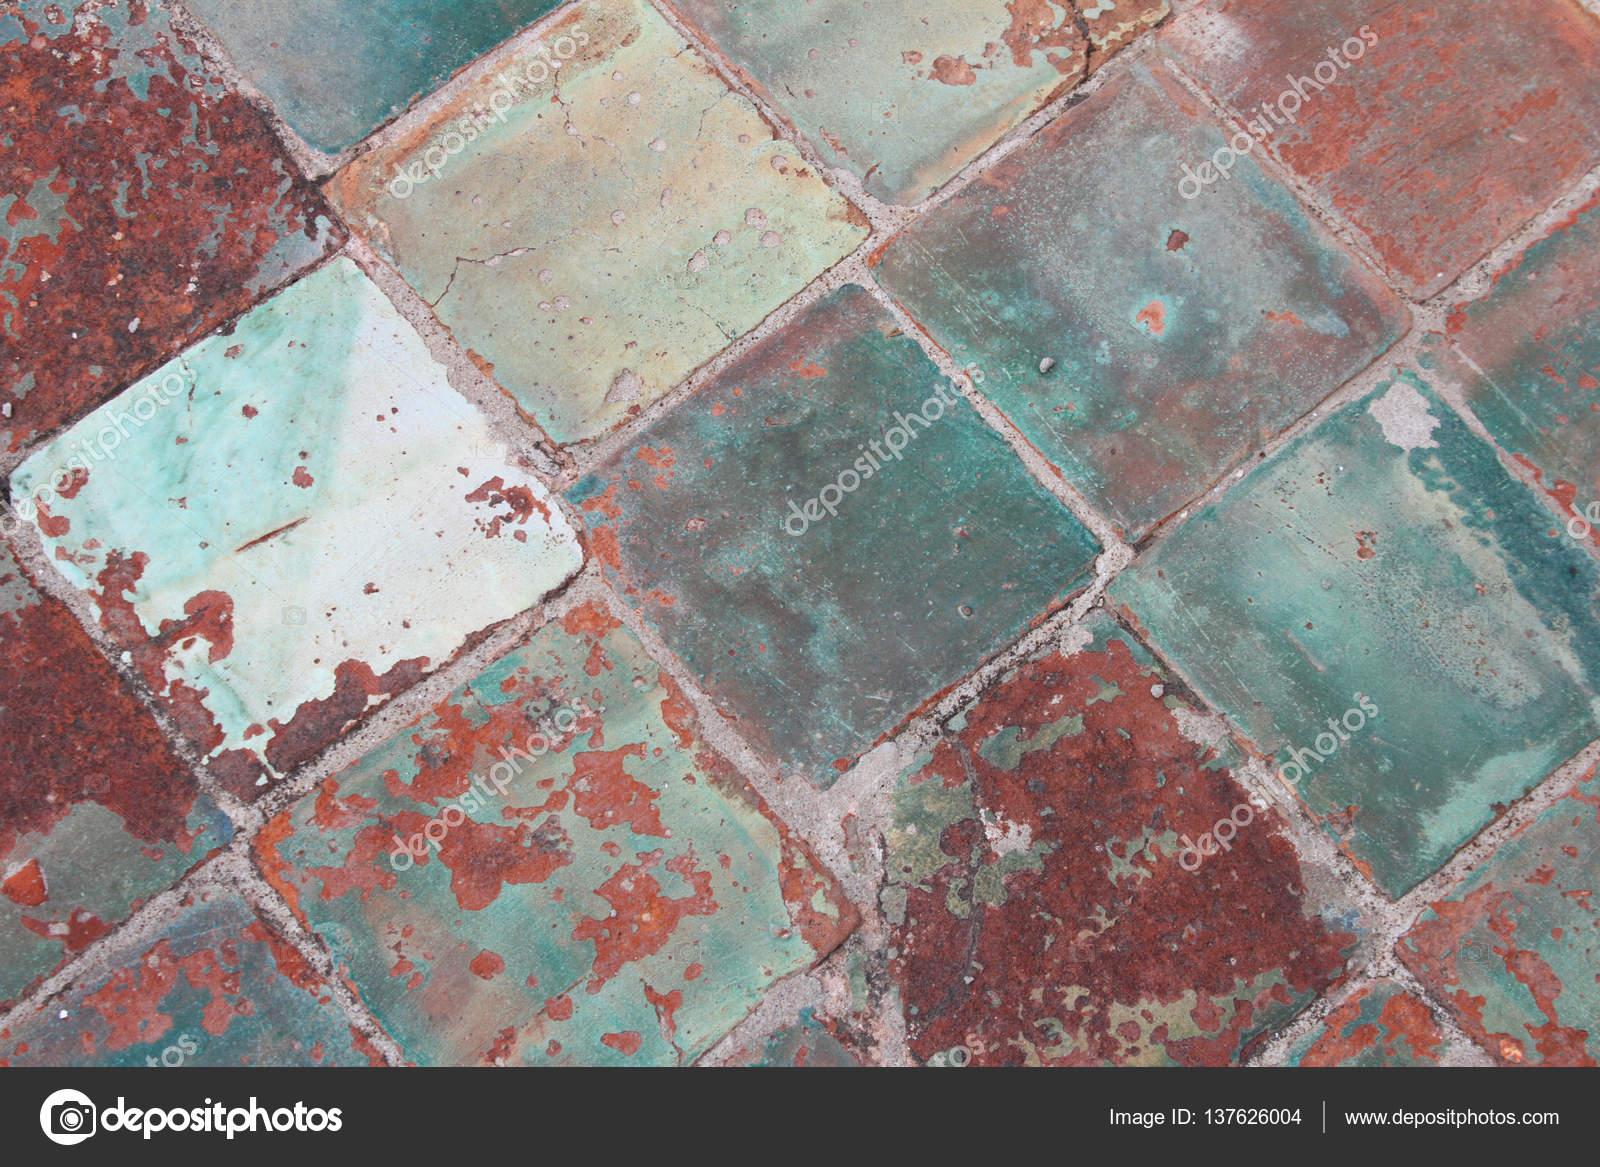 Wonderful 1 Inch Hexagon Floor Tiles Huge 12X12 Floor Tiles Shaped 12X24 Ceramic Tile Patterns 2 X 12 Ceramic Tile Young 2X6 Subway Tile White3D Ceiling Tiles Antique Green Ceramic Floor Tiles \u2014 Stock Photo © Jmillard37 #137626004